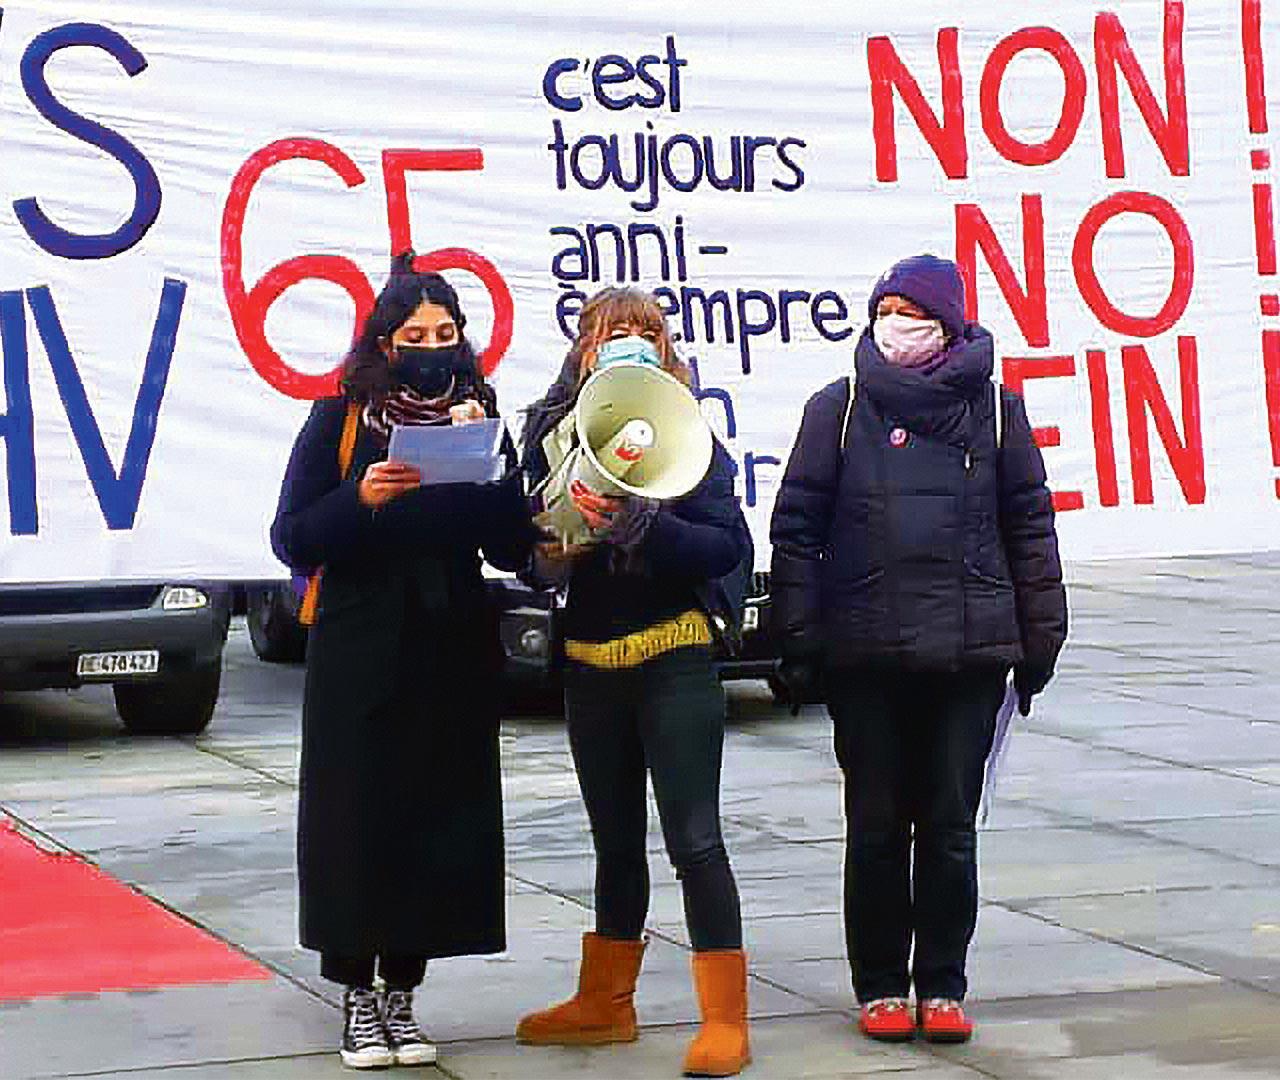 Action avs21 berne 14.12.2020